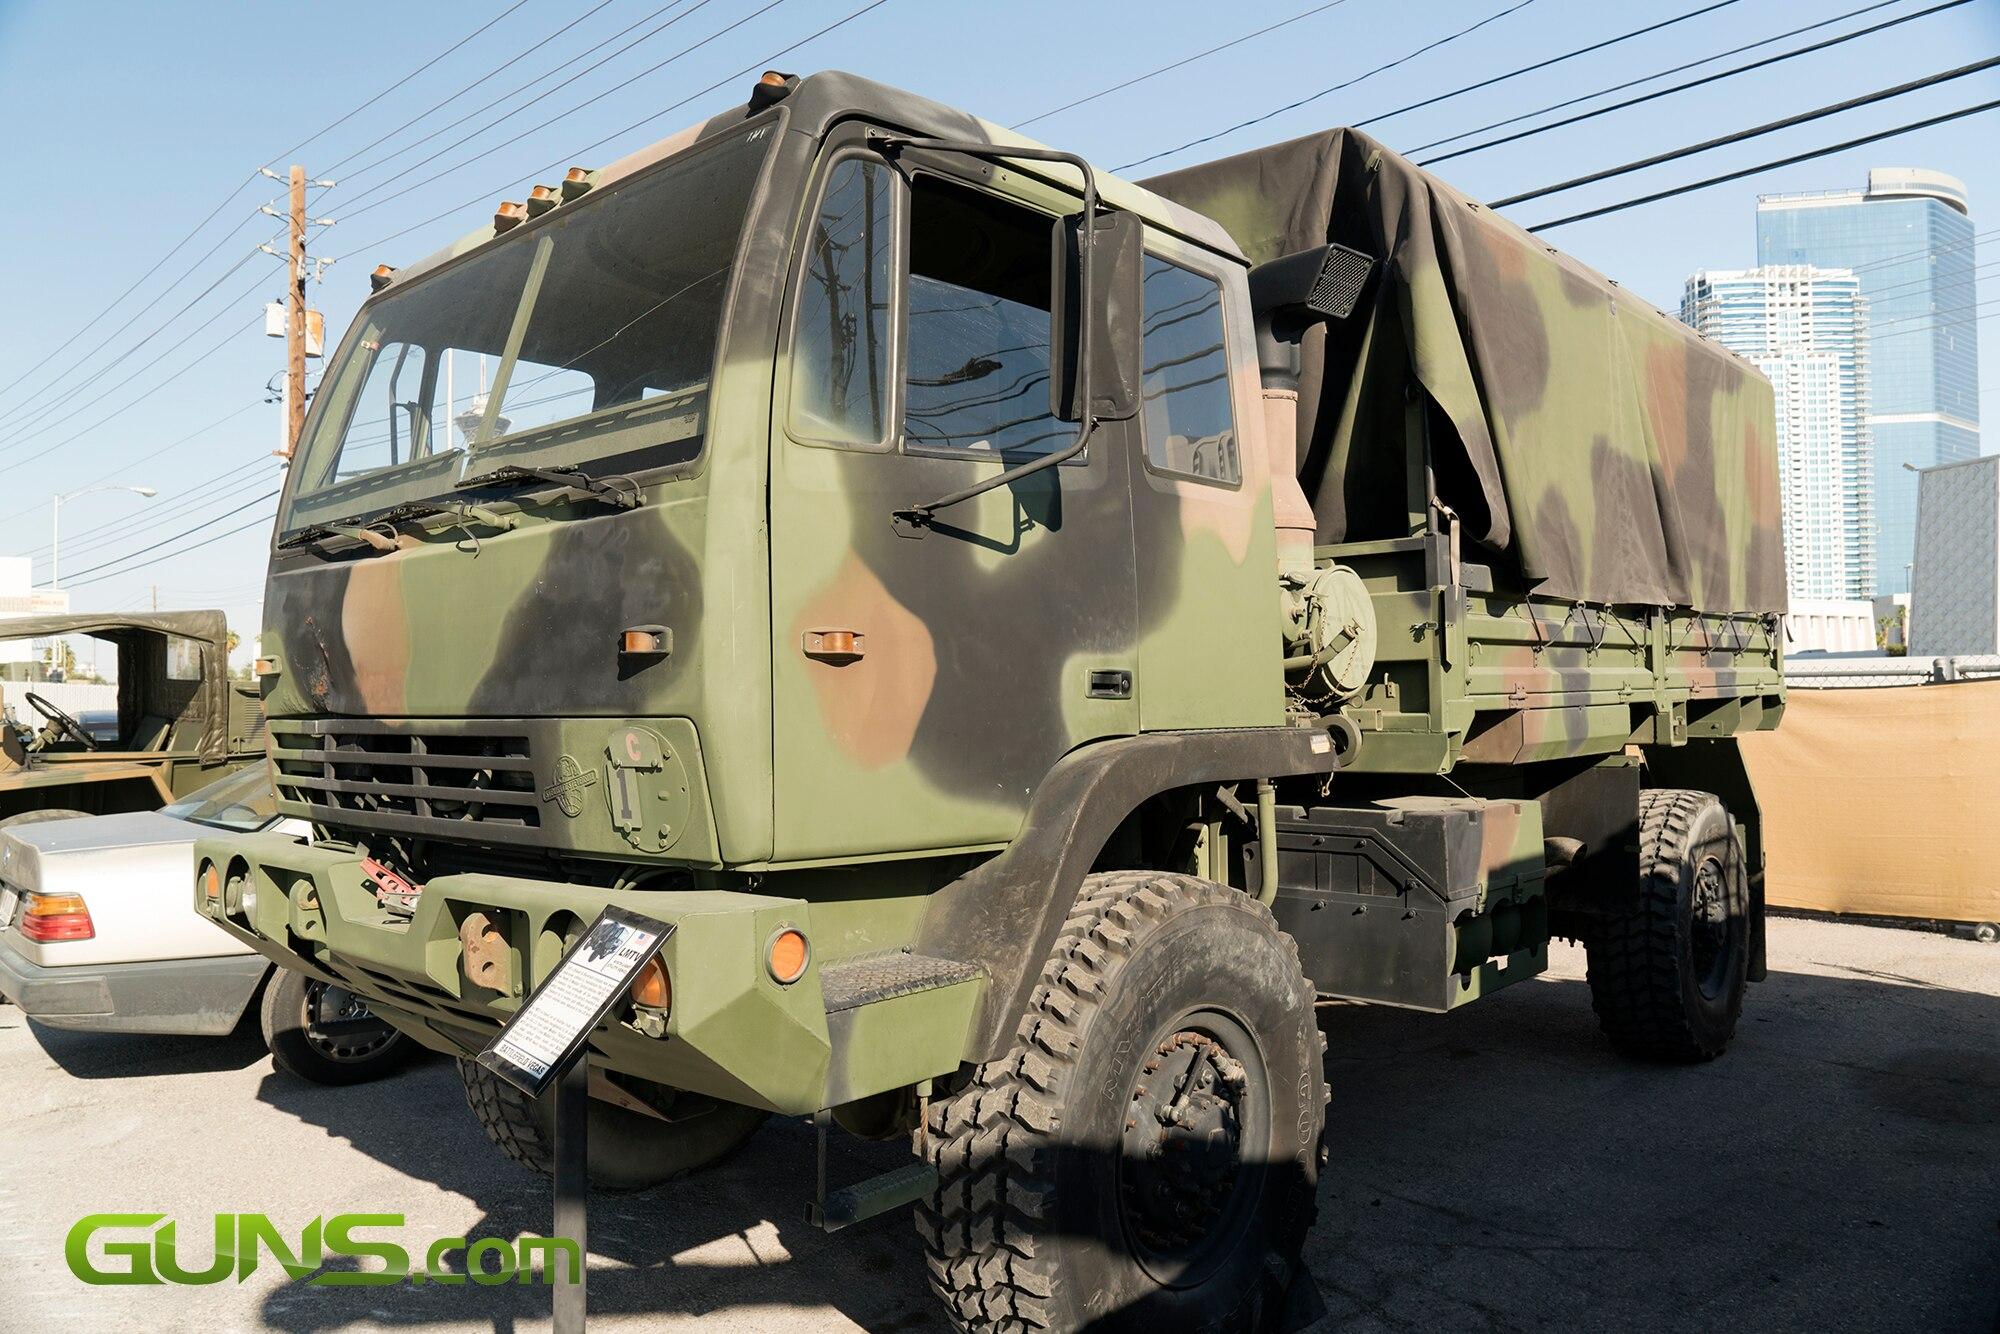 U.S. LMTV M1078 Light Utility Vehicle